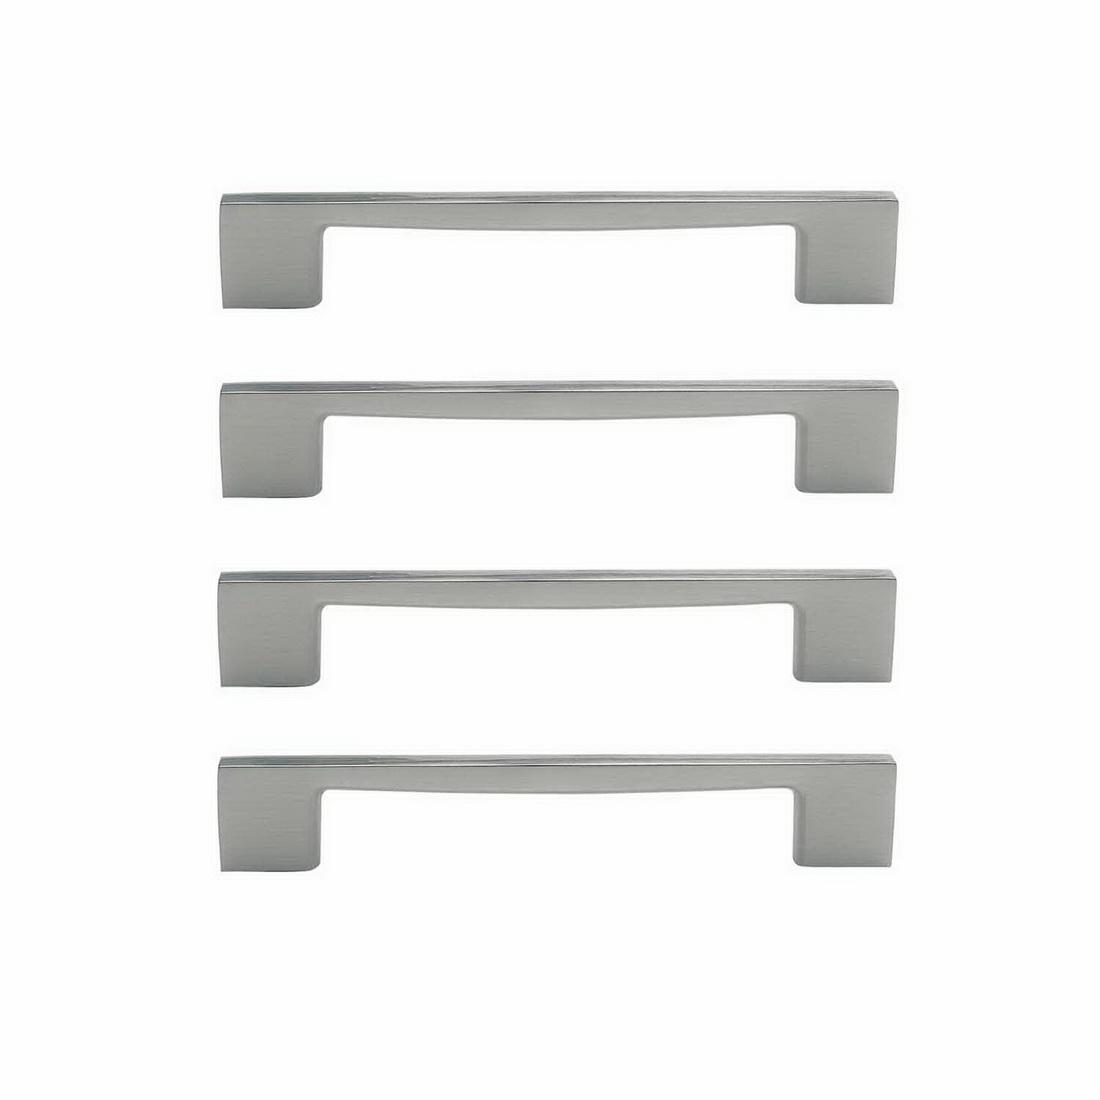 Marco Cabinet Handle 160mm Zinc Die-Cast Brushed Nickel 4 pack 6338-4-BN